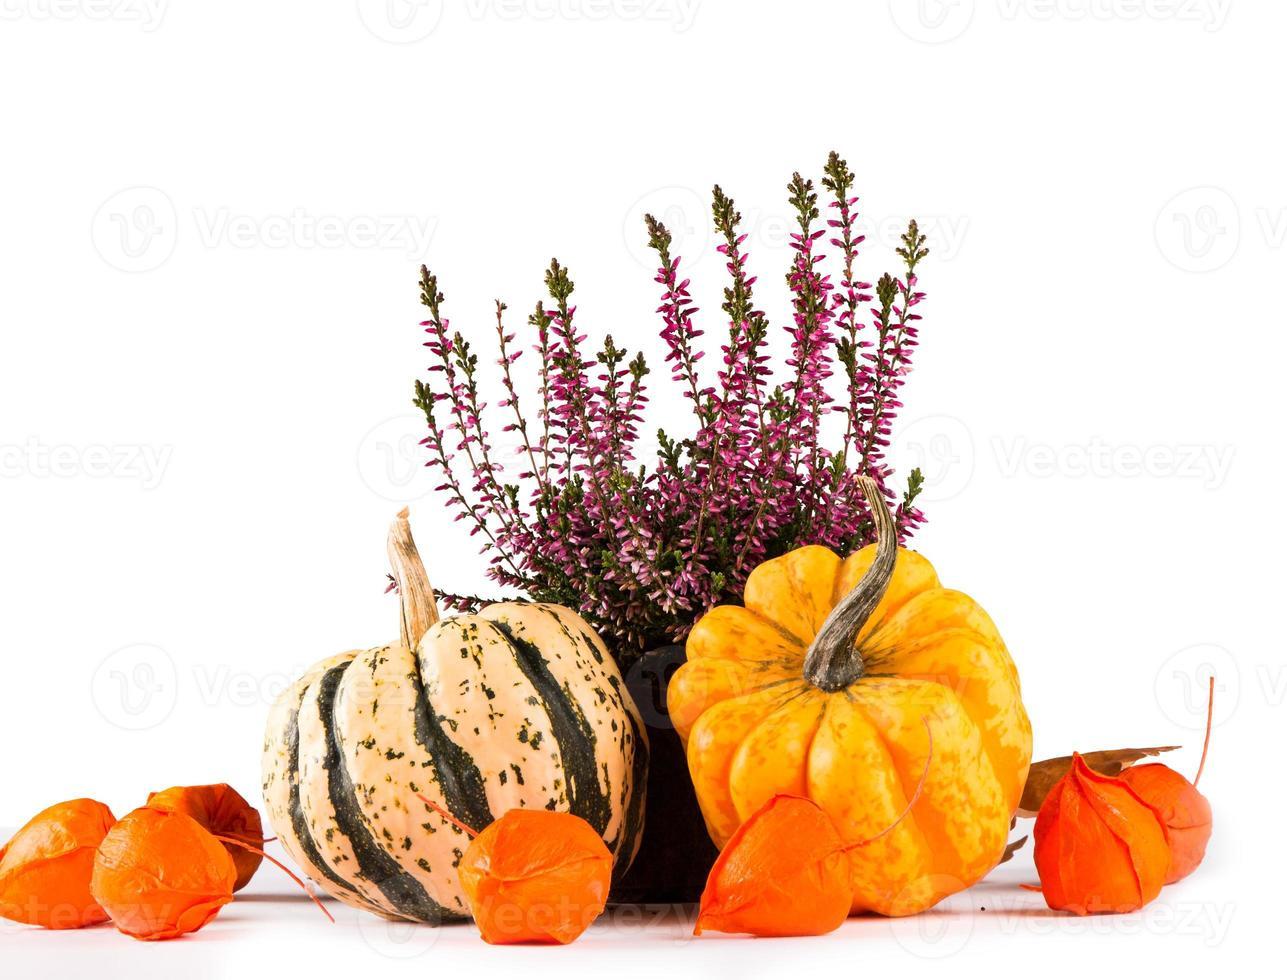 autumn concept photo